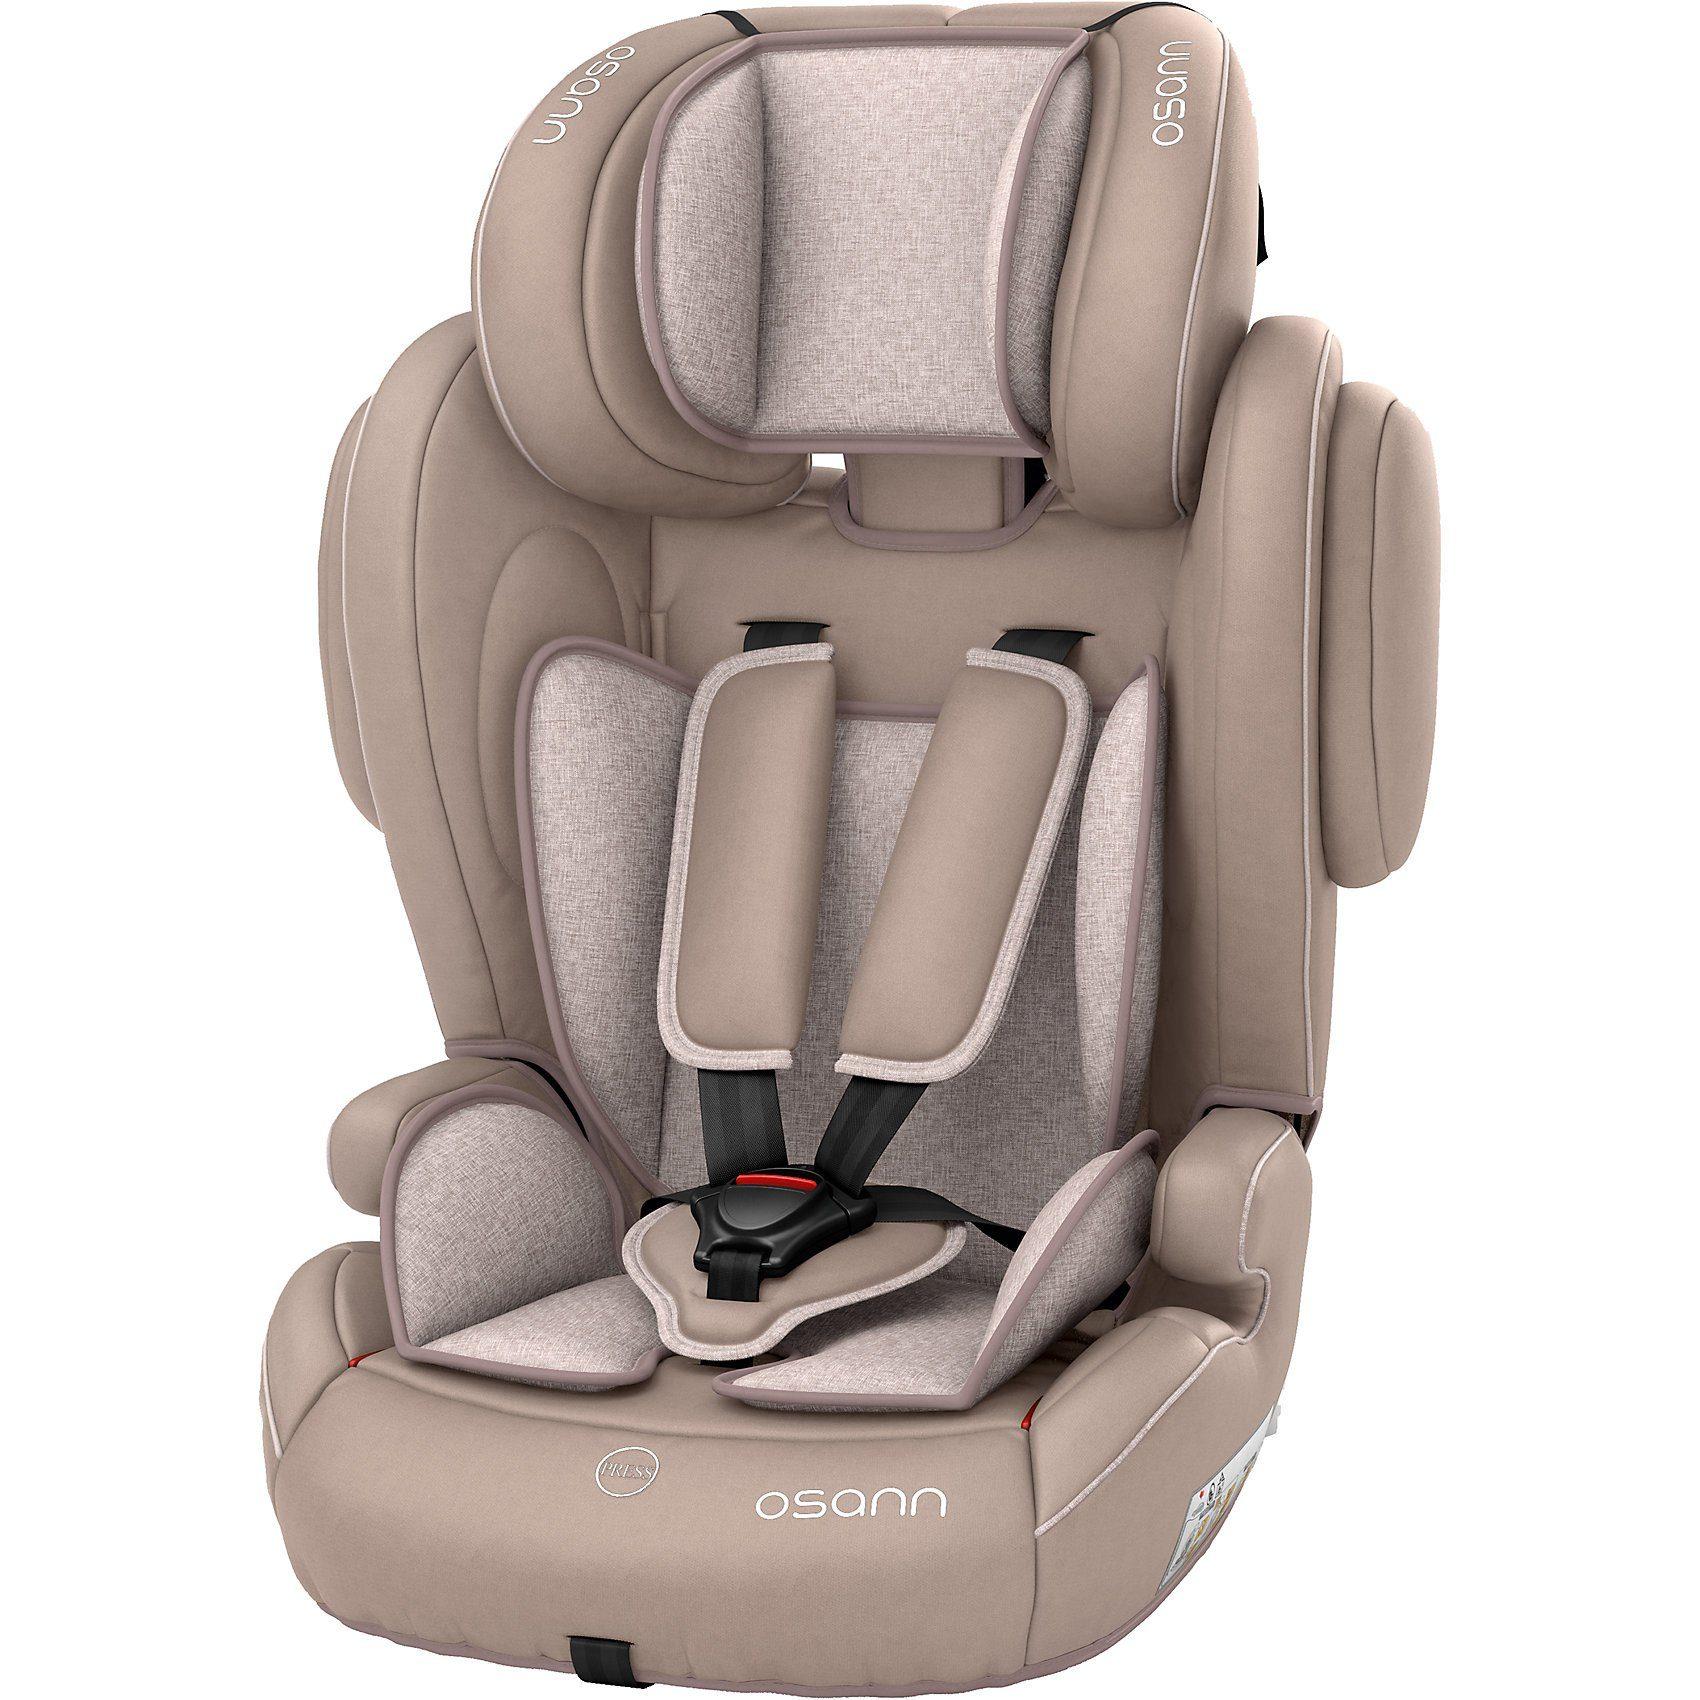 Osann Auto-Kindersitz Flux Plus, Beige Melange, 2018